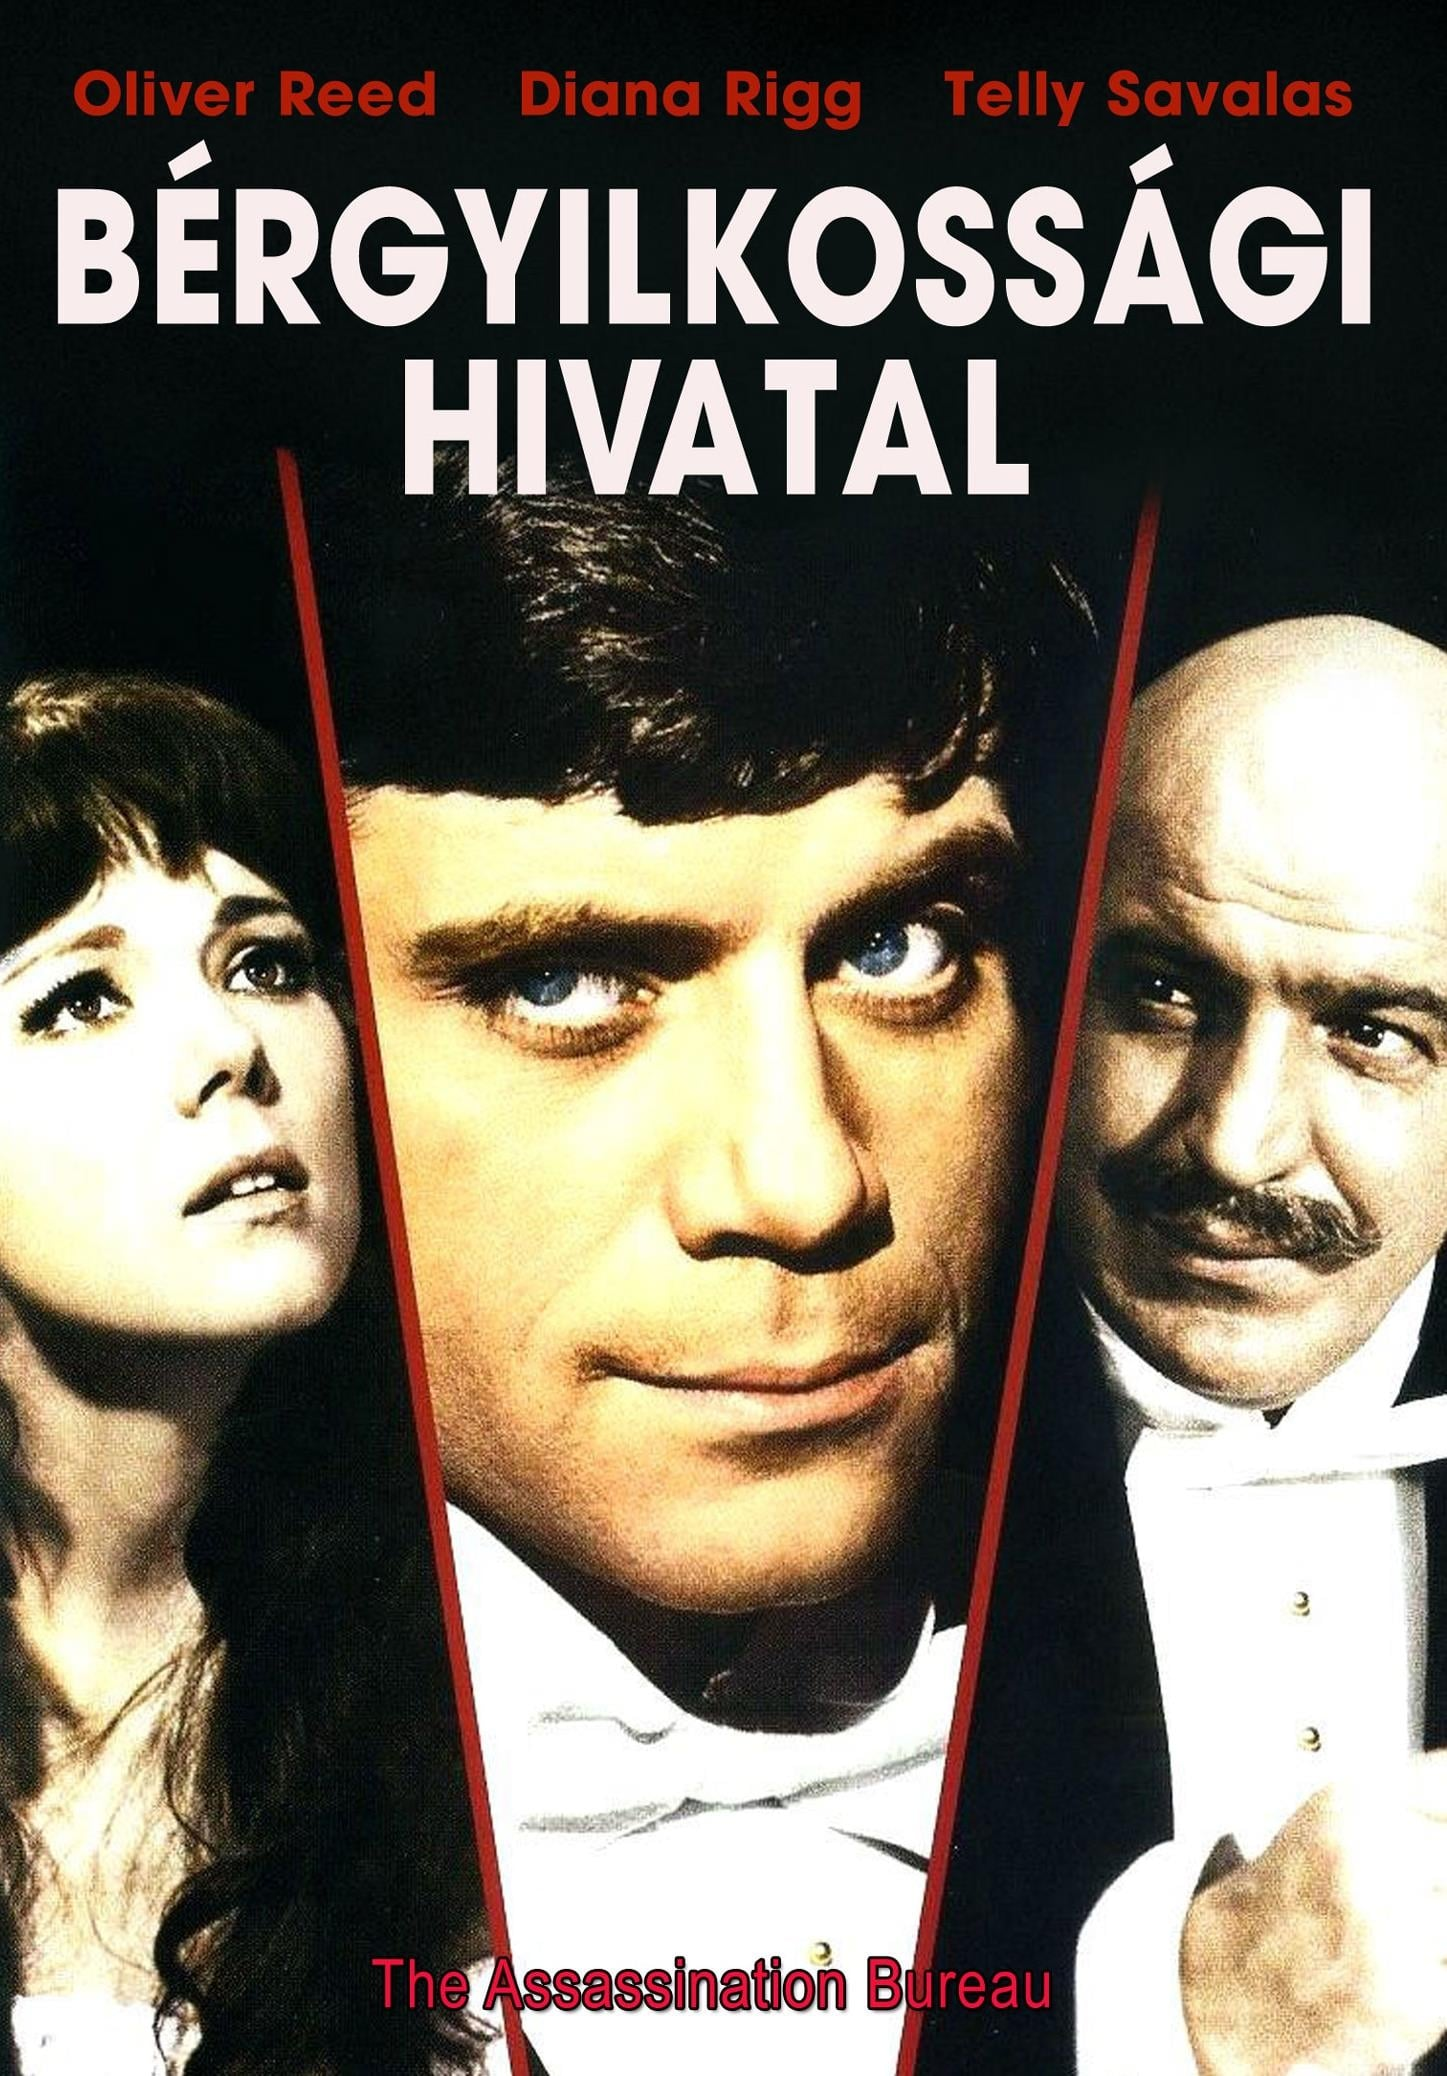 the assassination bureau 1969 gratis films kijken met ondertiteling. Black Bedroom Furniture Sets. Home Design Ideas